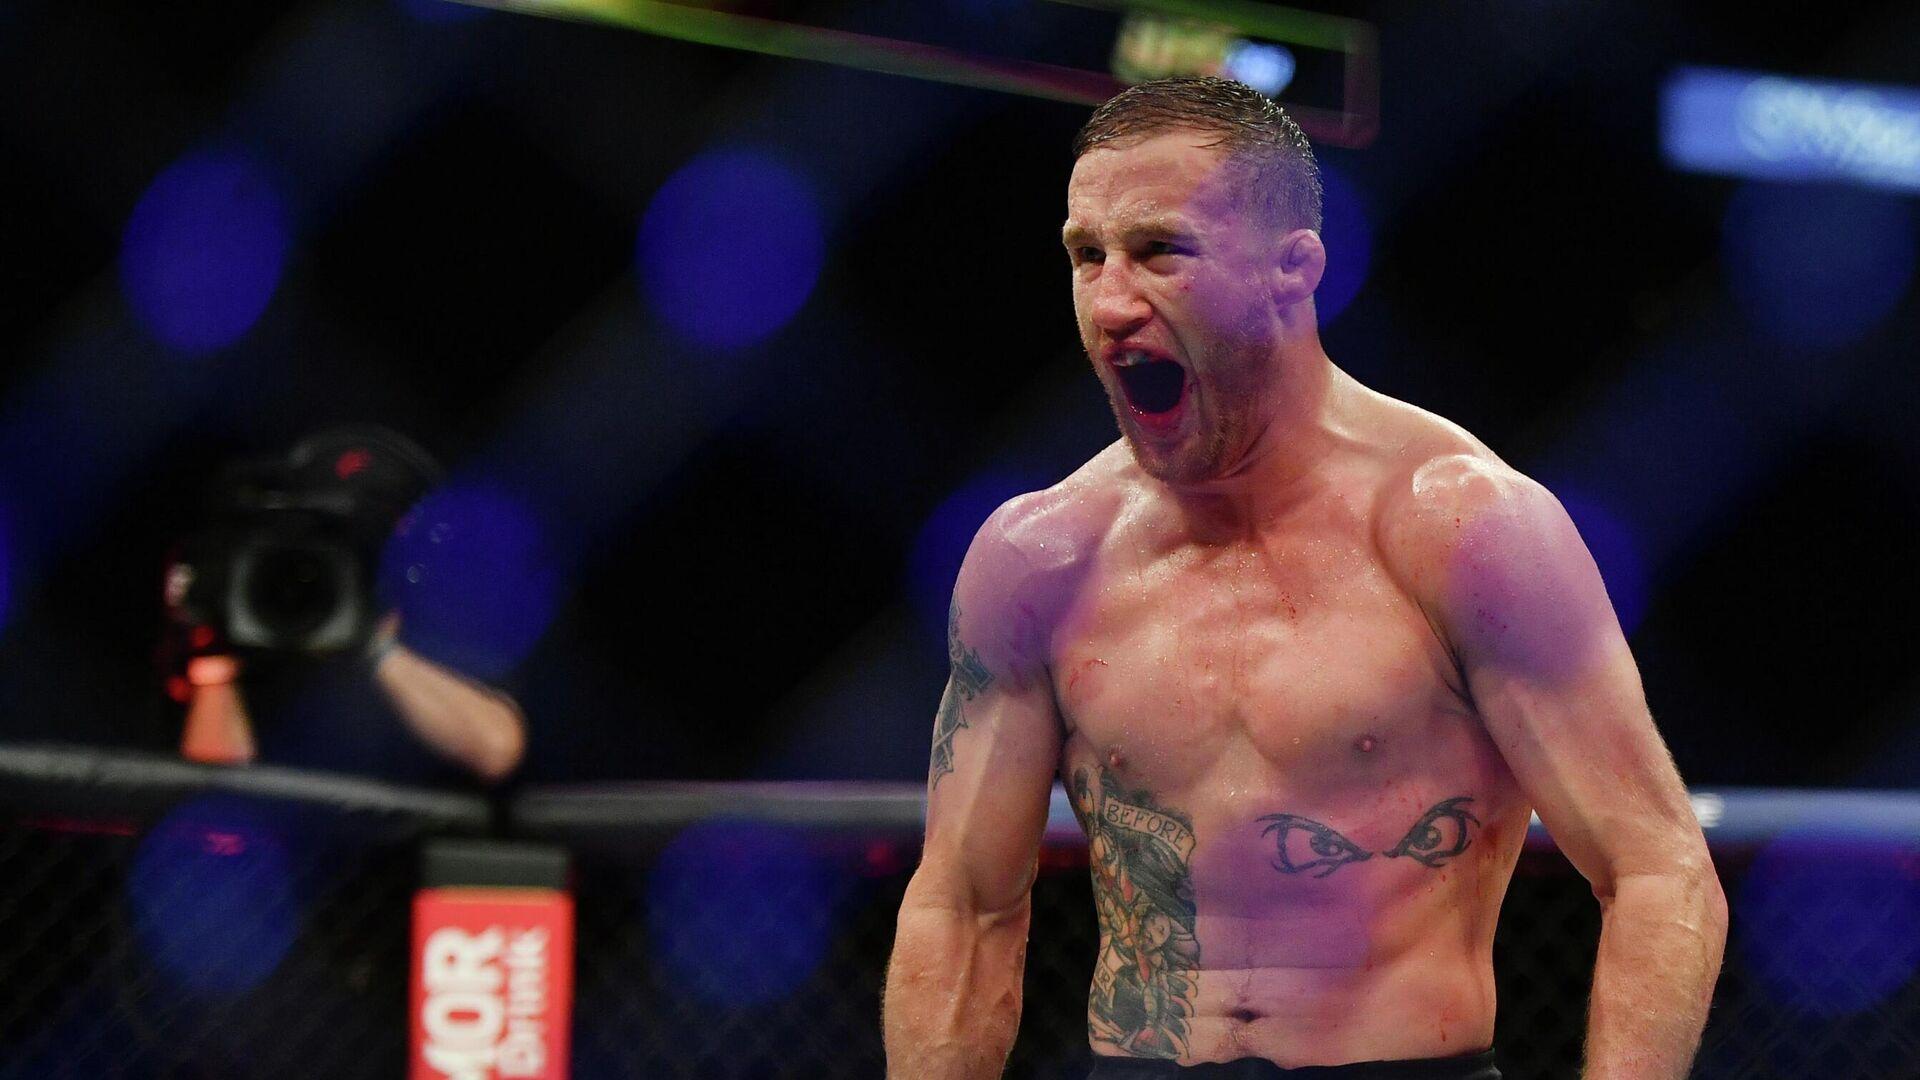 Американский боец UFC Джастин Гэтжи - РИА Новости, 1920, 30.06.2020